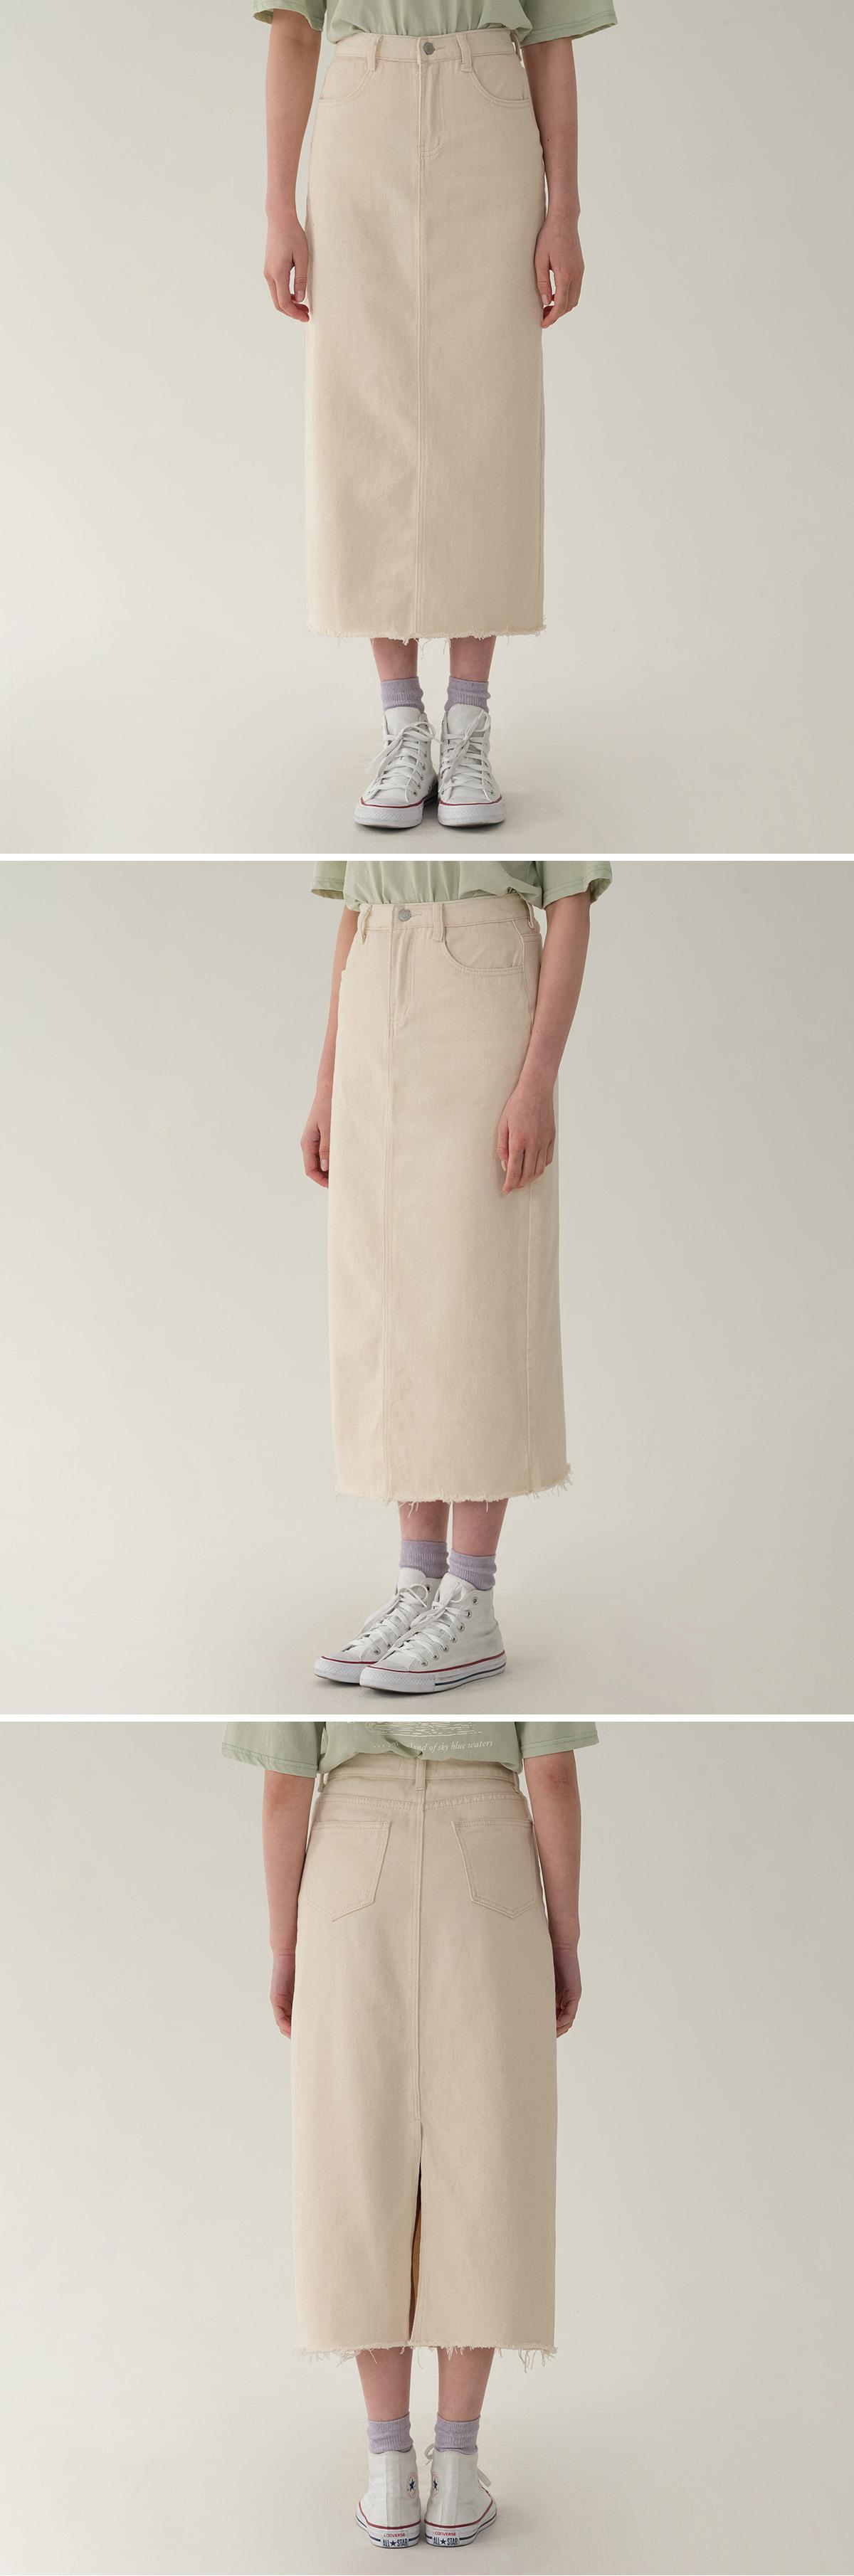 h-line cotton skirt